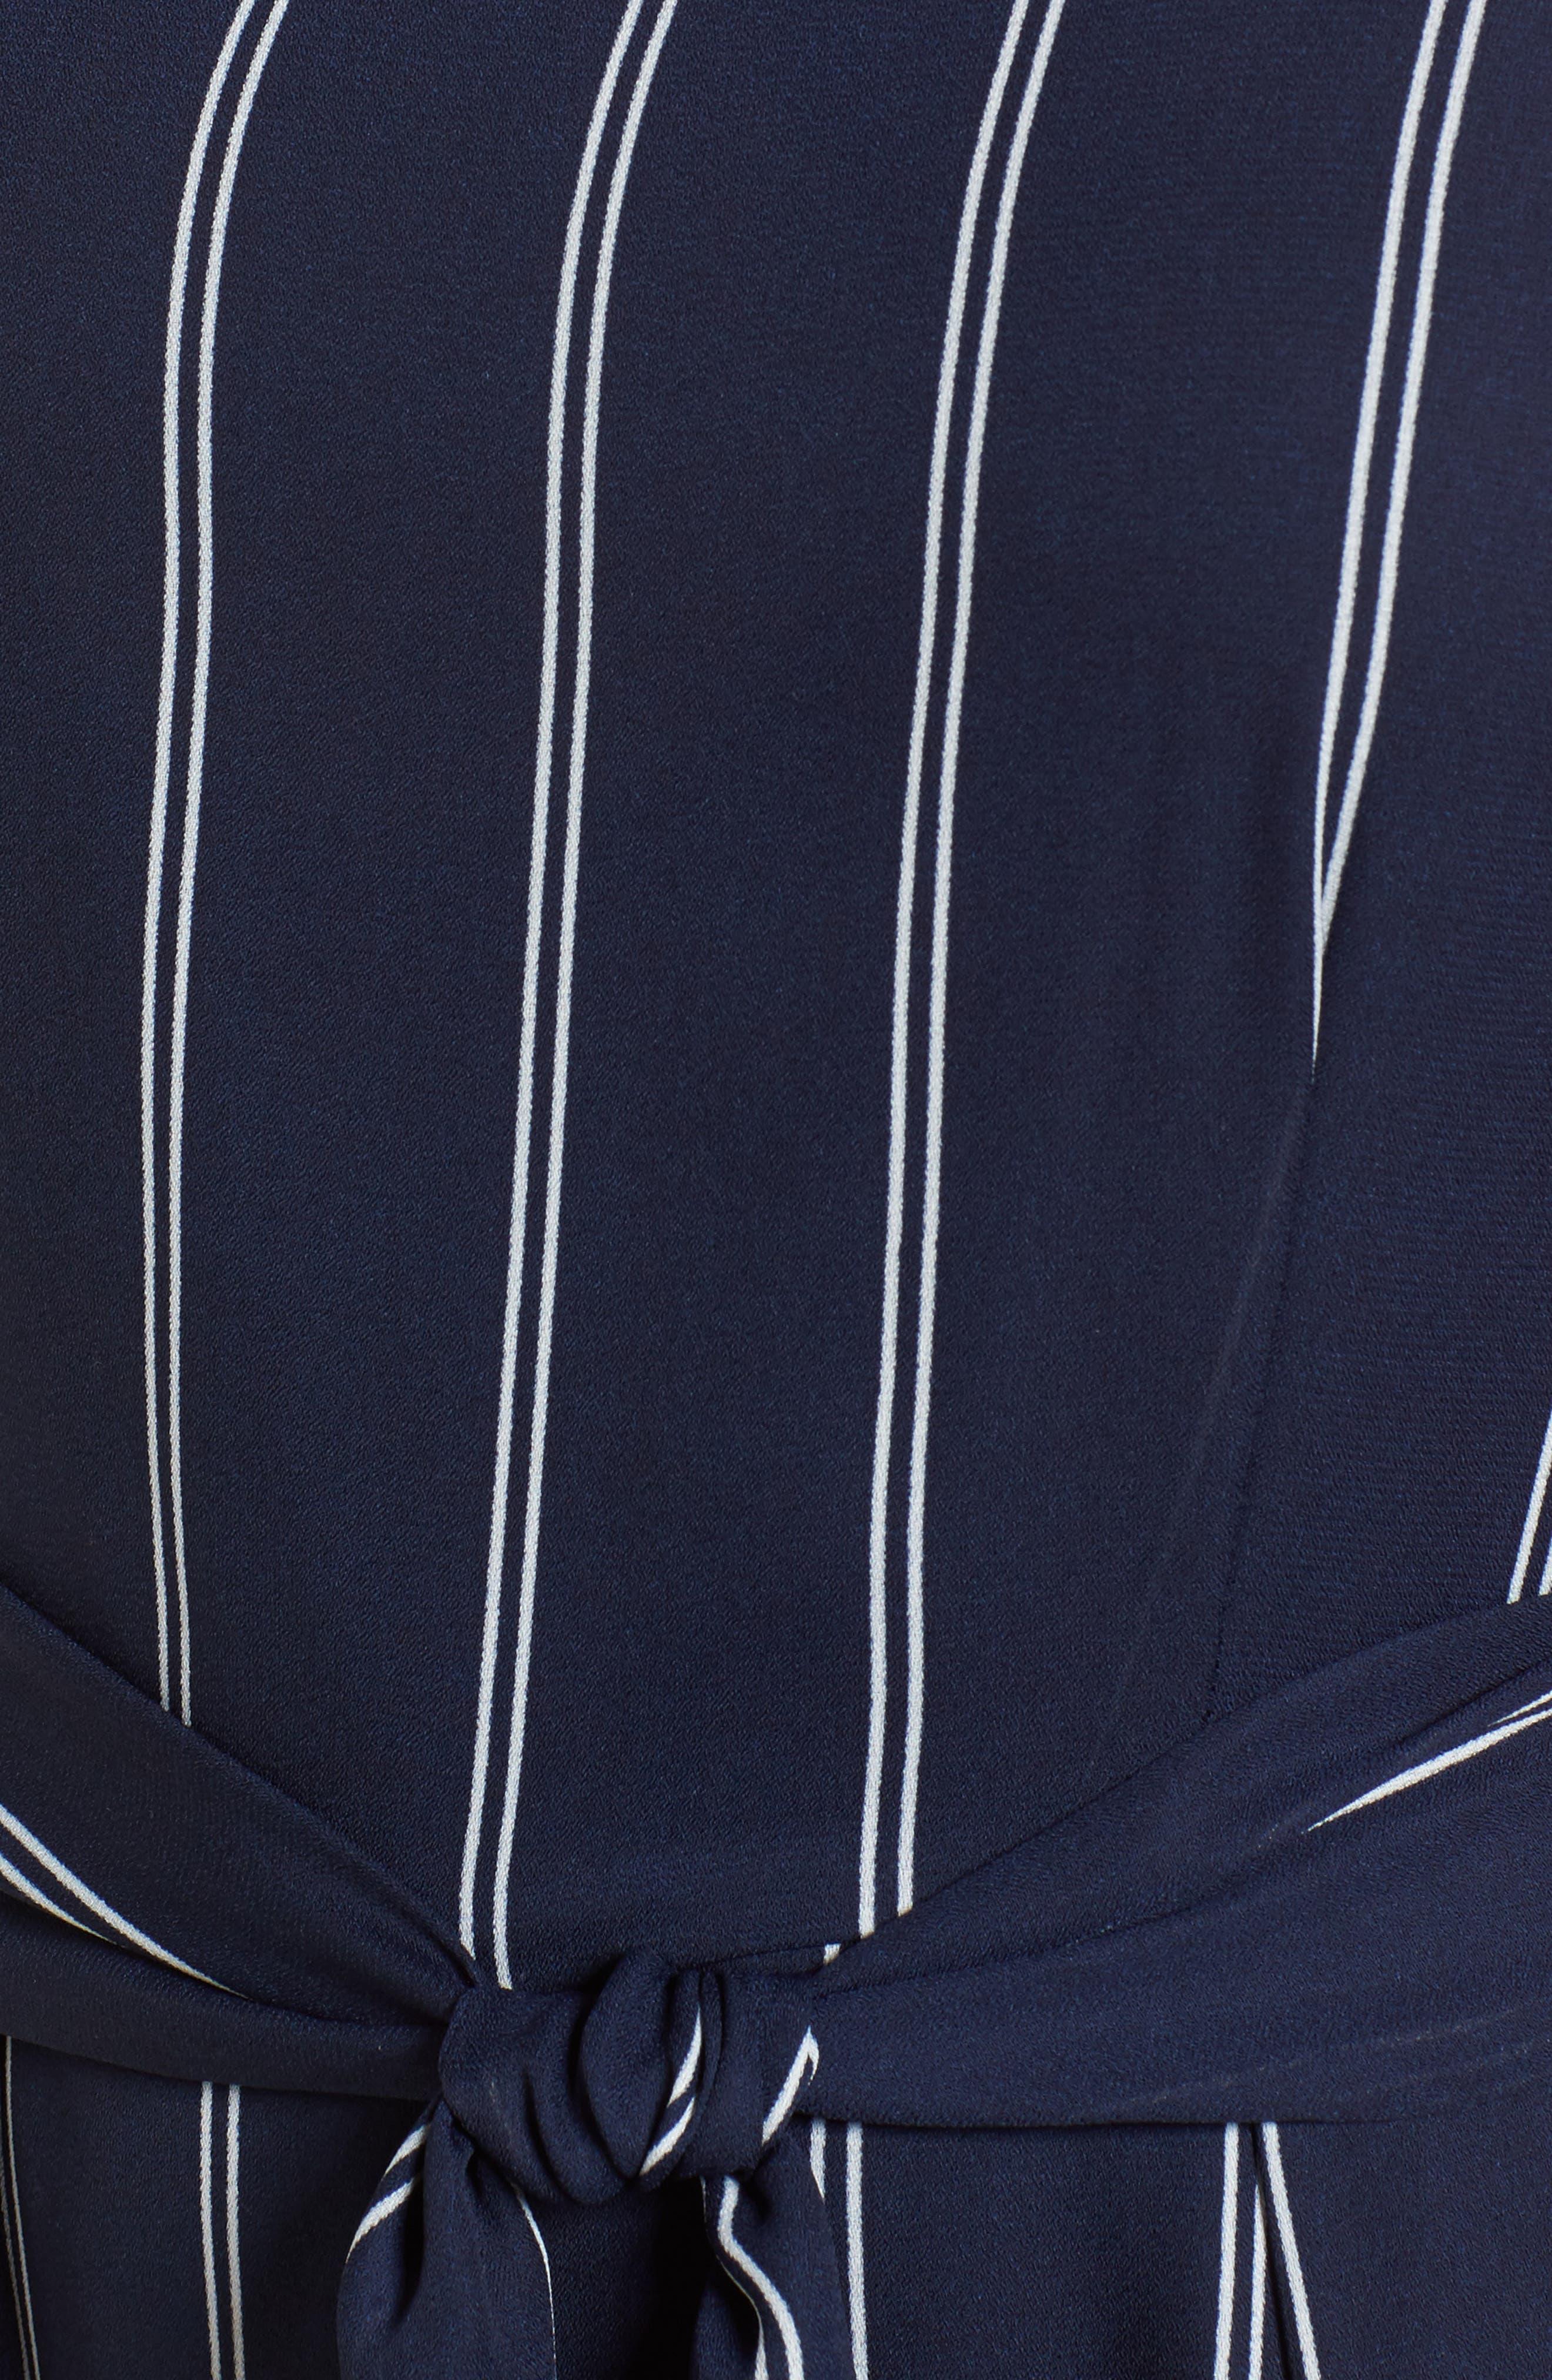 Stripe Jumpsuit,                             Alternate thumbnail 5, color,                             Navy/Ivory